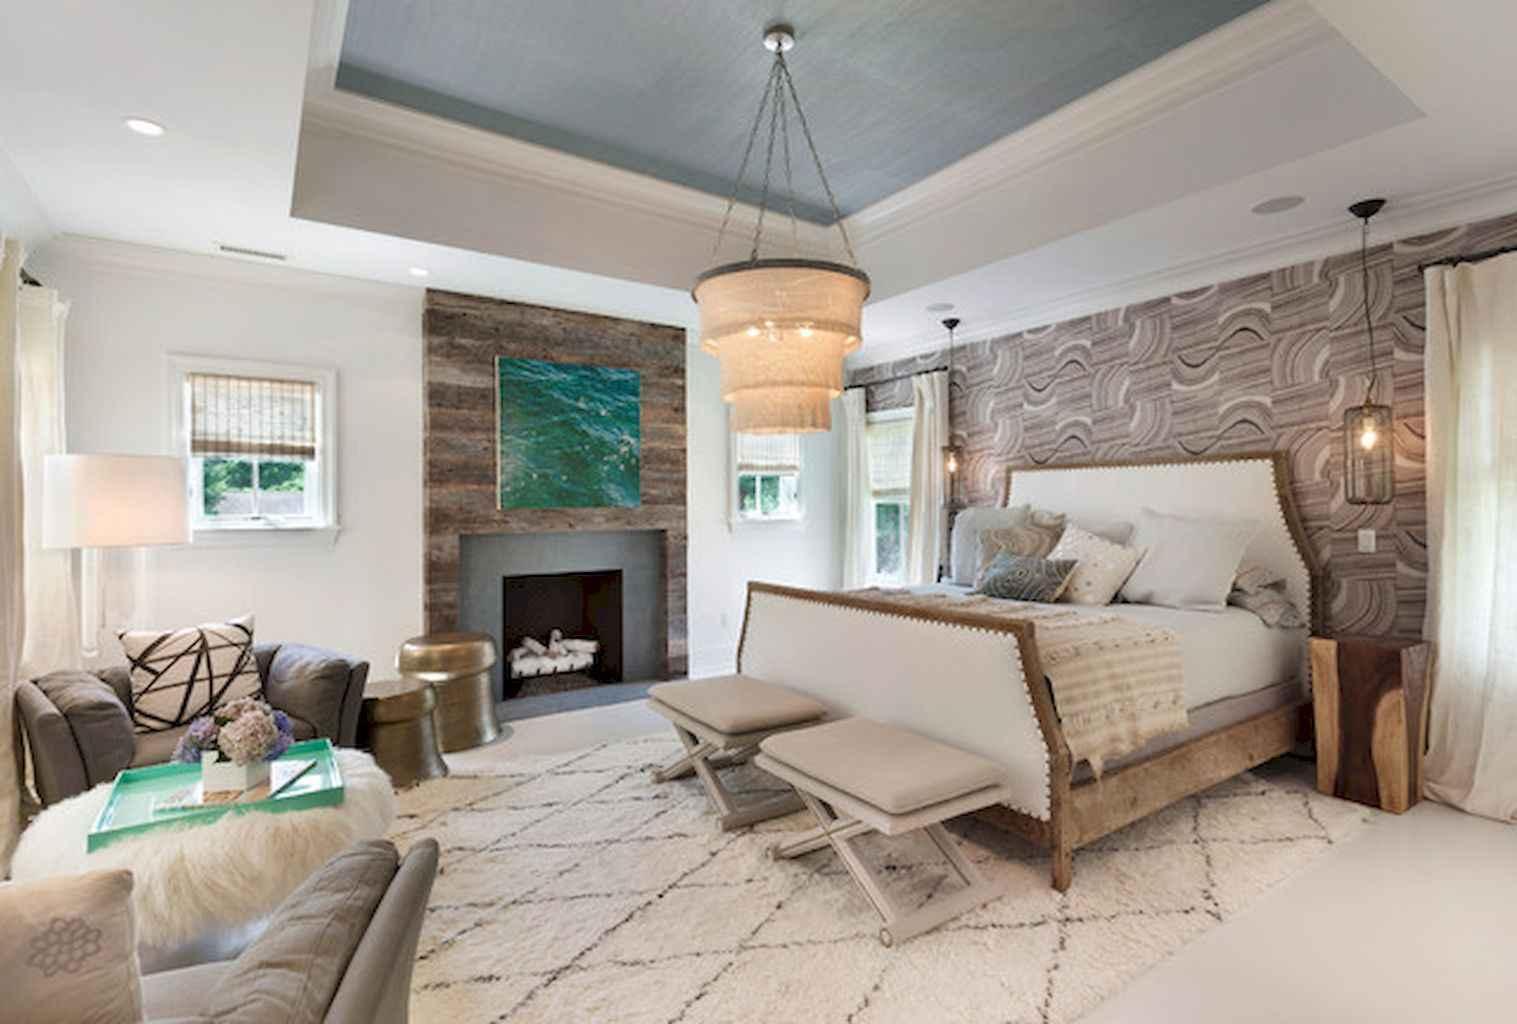 100 Stunning Farmhouse Master Bedroom Decor Ideas (87)